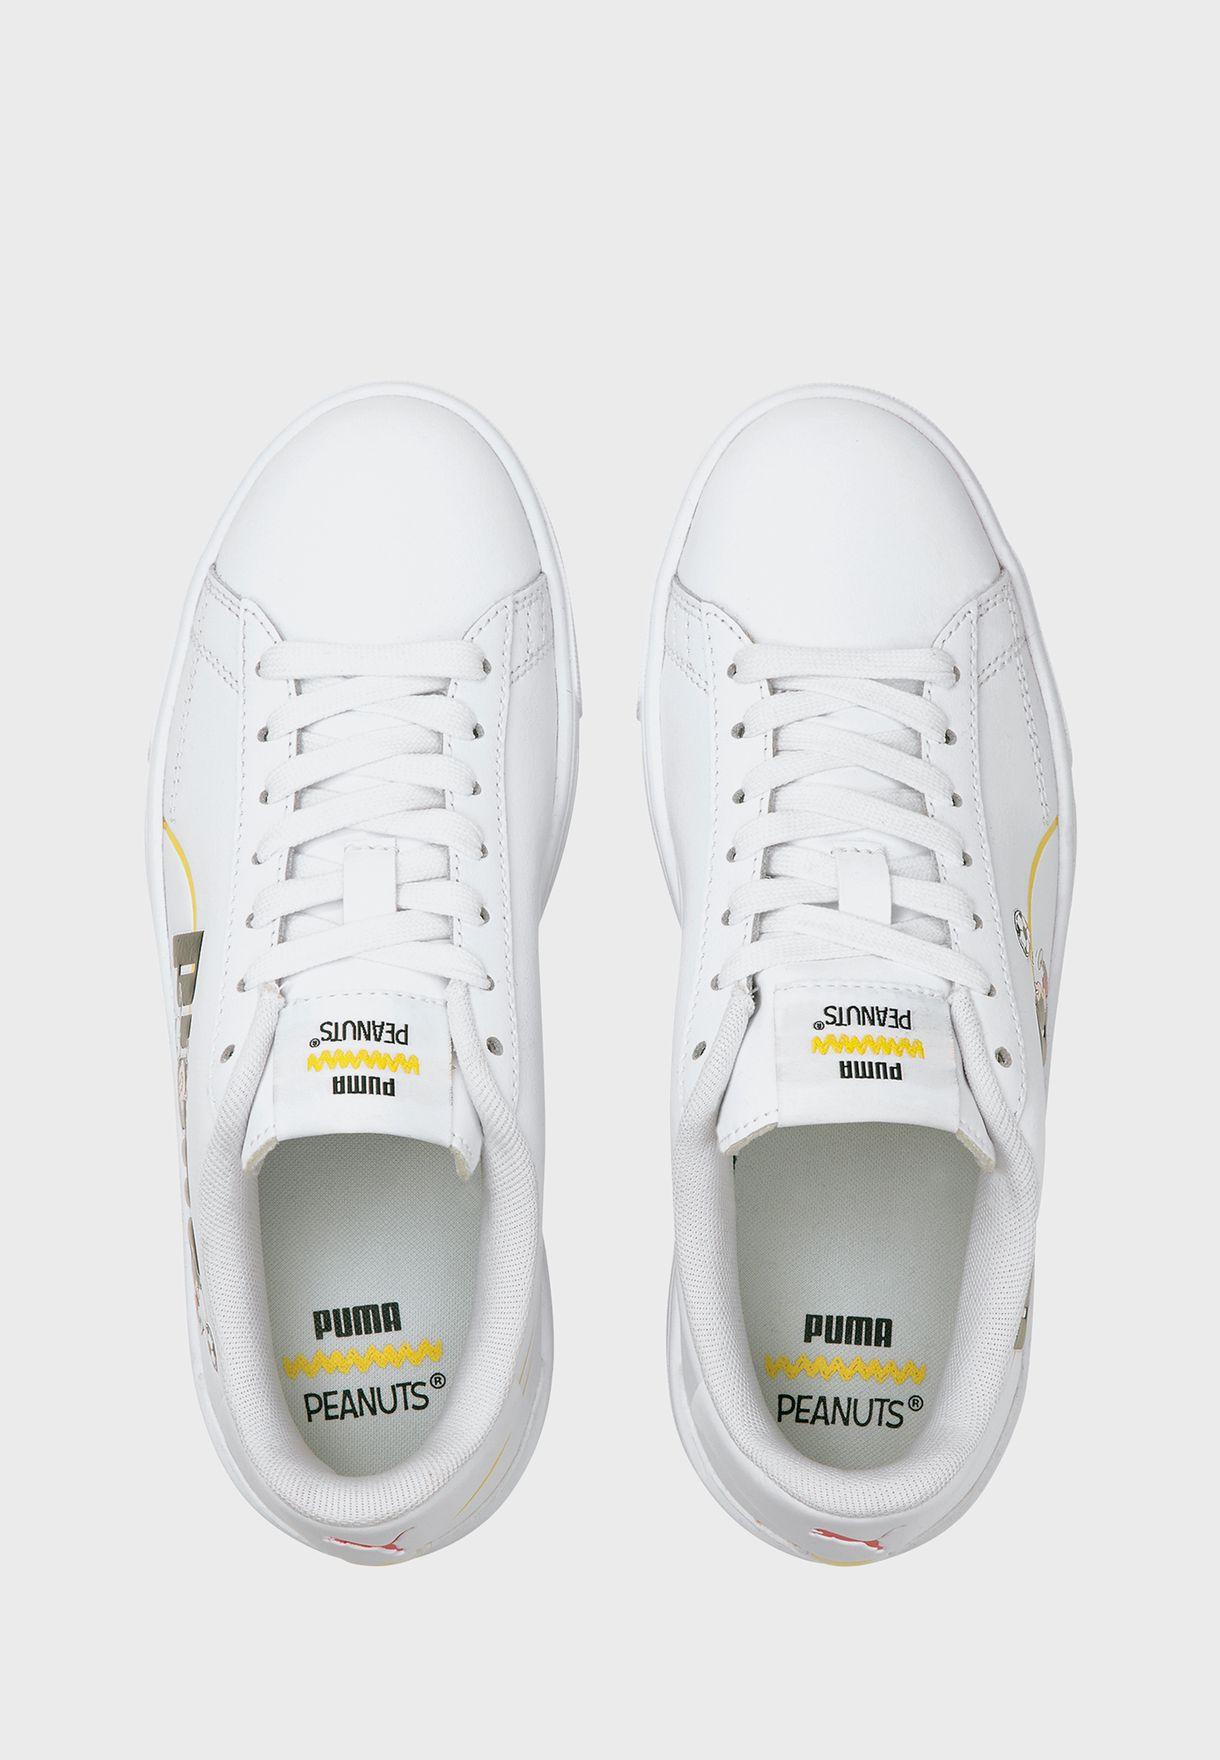 حذاء بيناتس سيرف برو